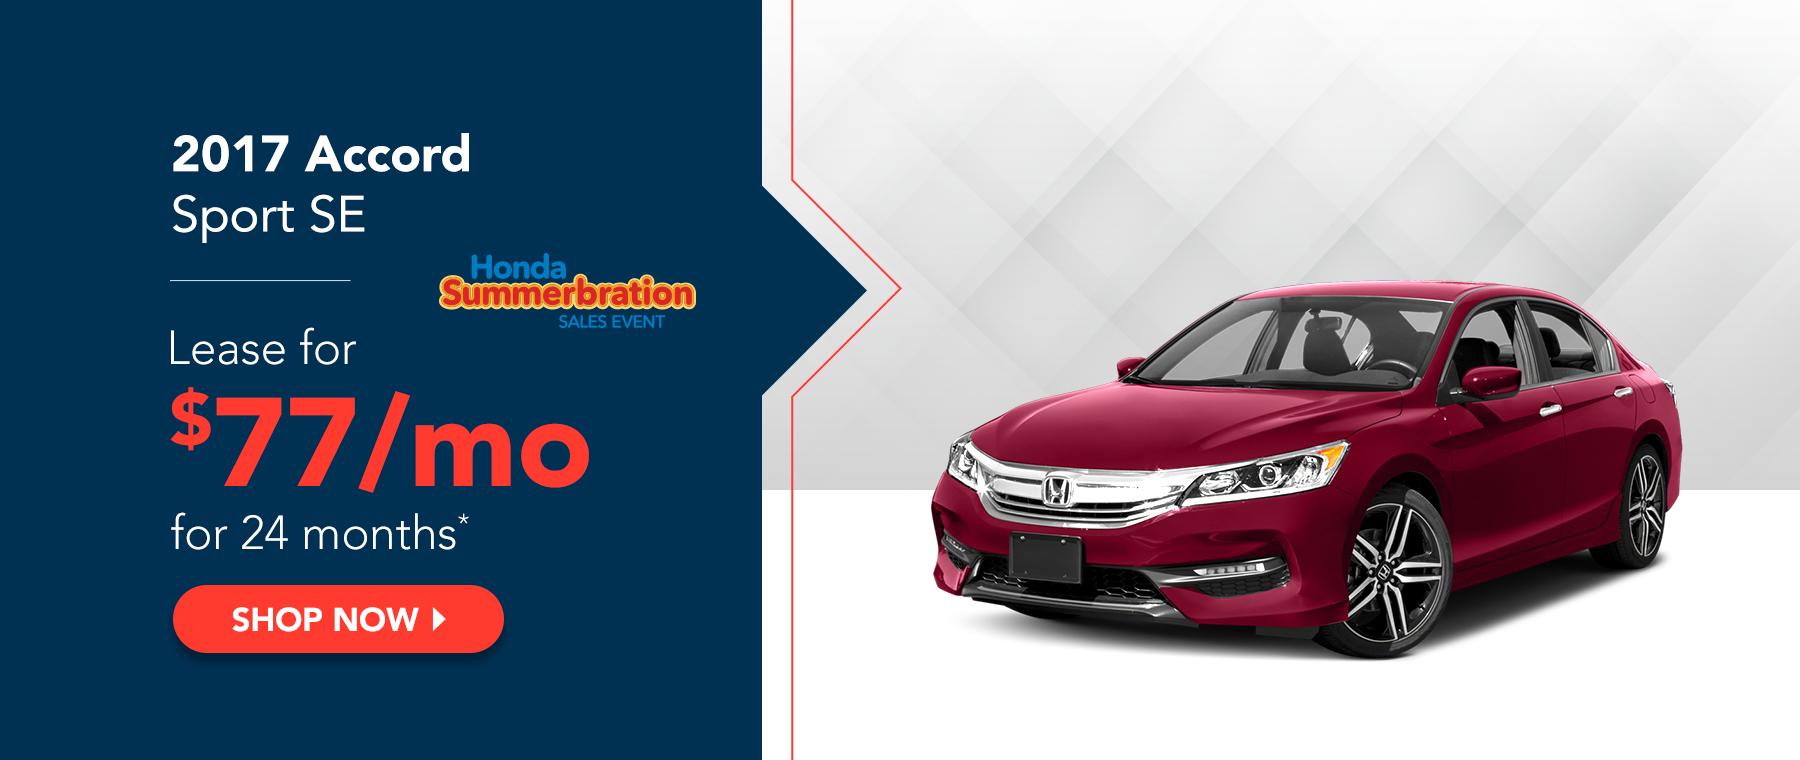 2017 Honda Accord Sport SE - Honda Summerbration Sales Event